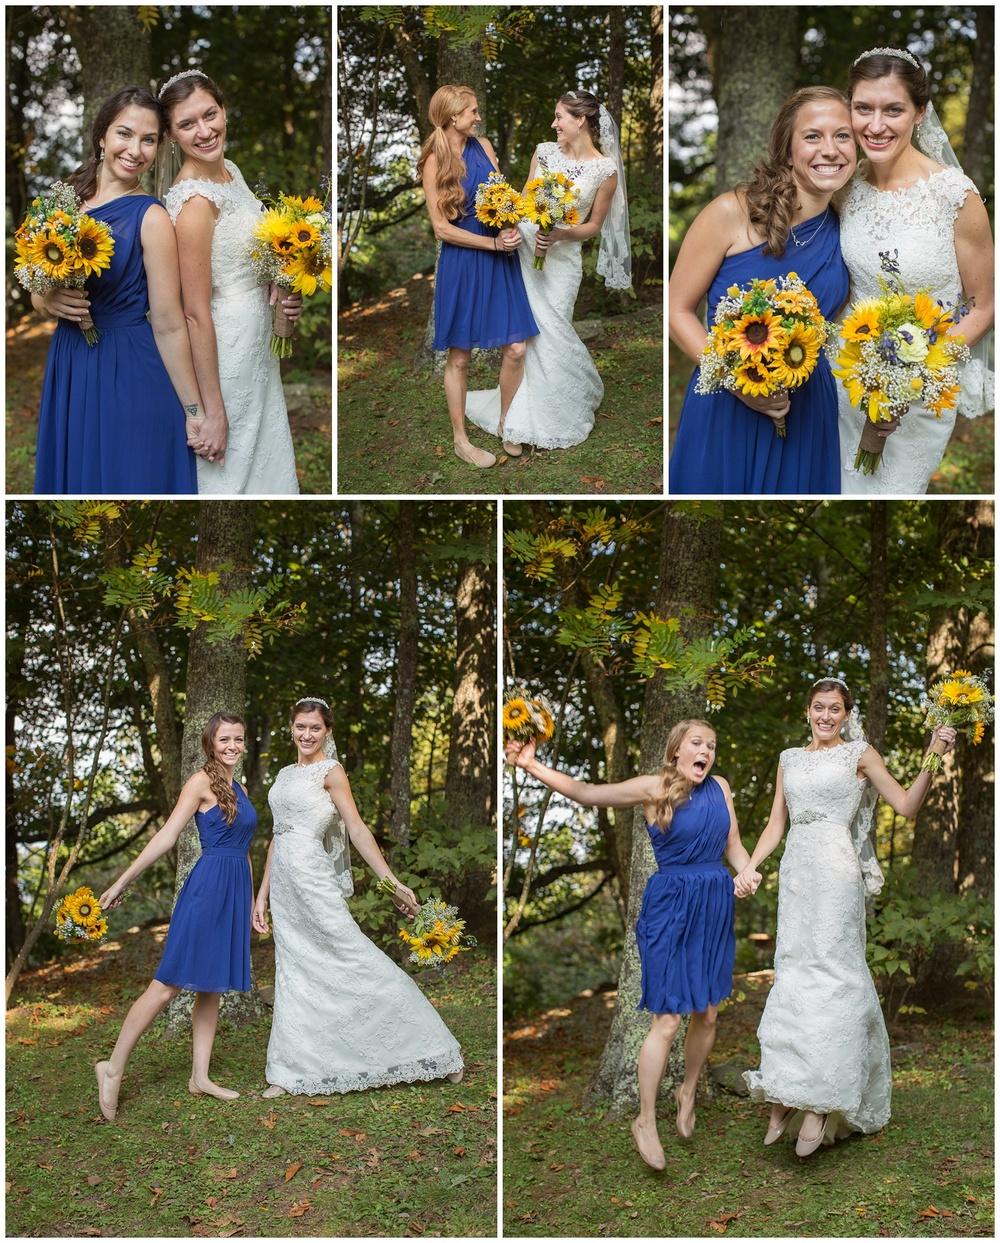 West-Jefferson-Wedding-042.JPG